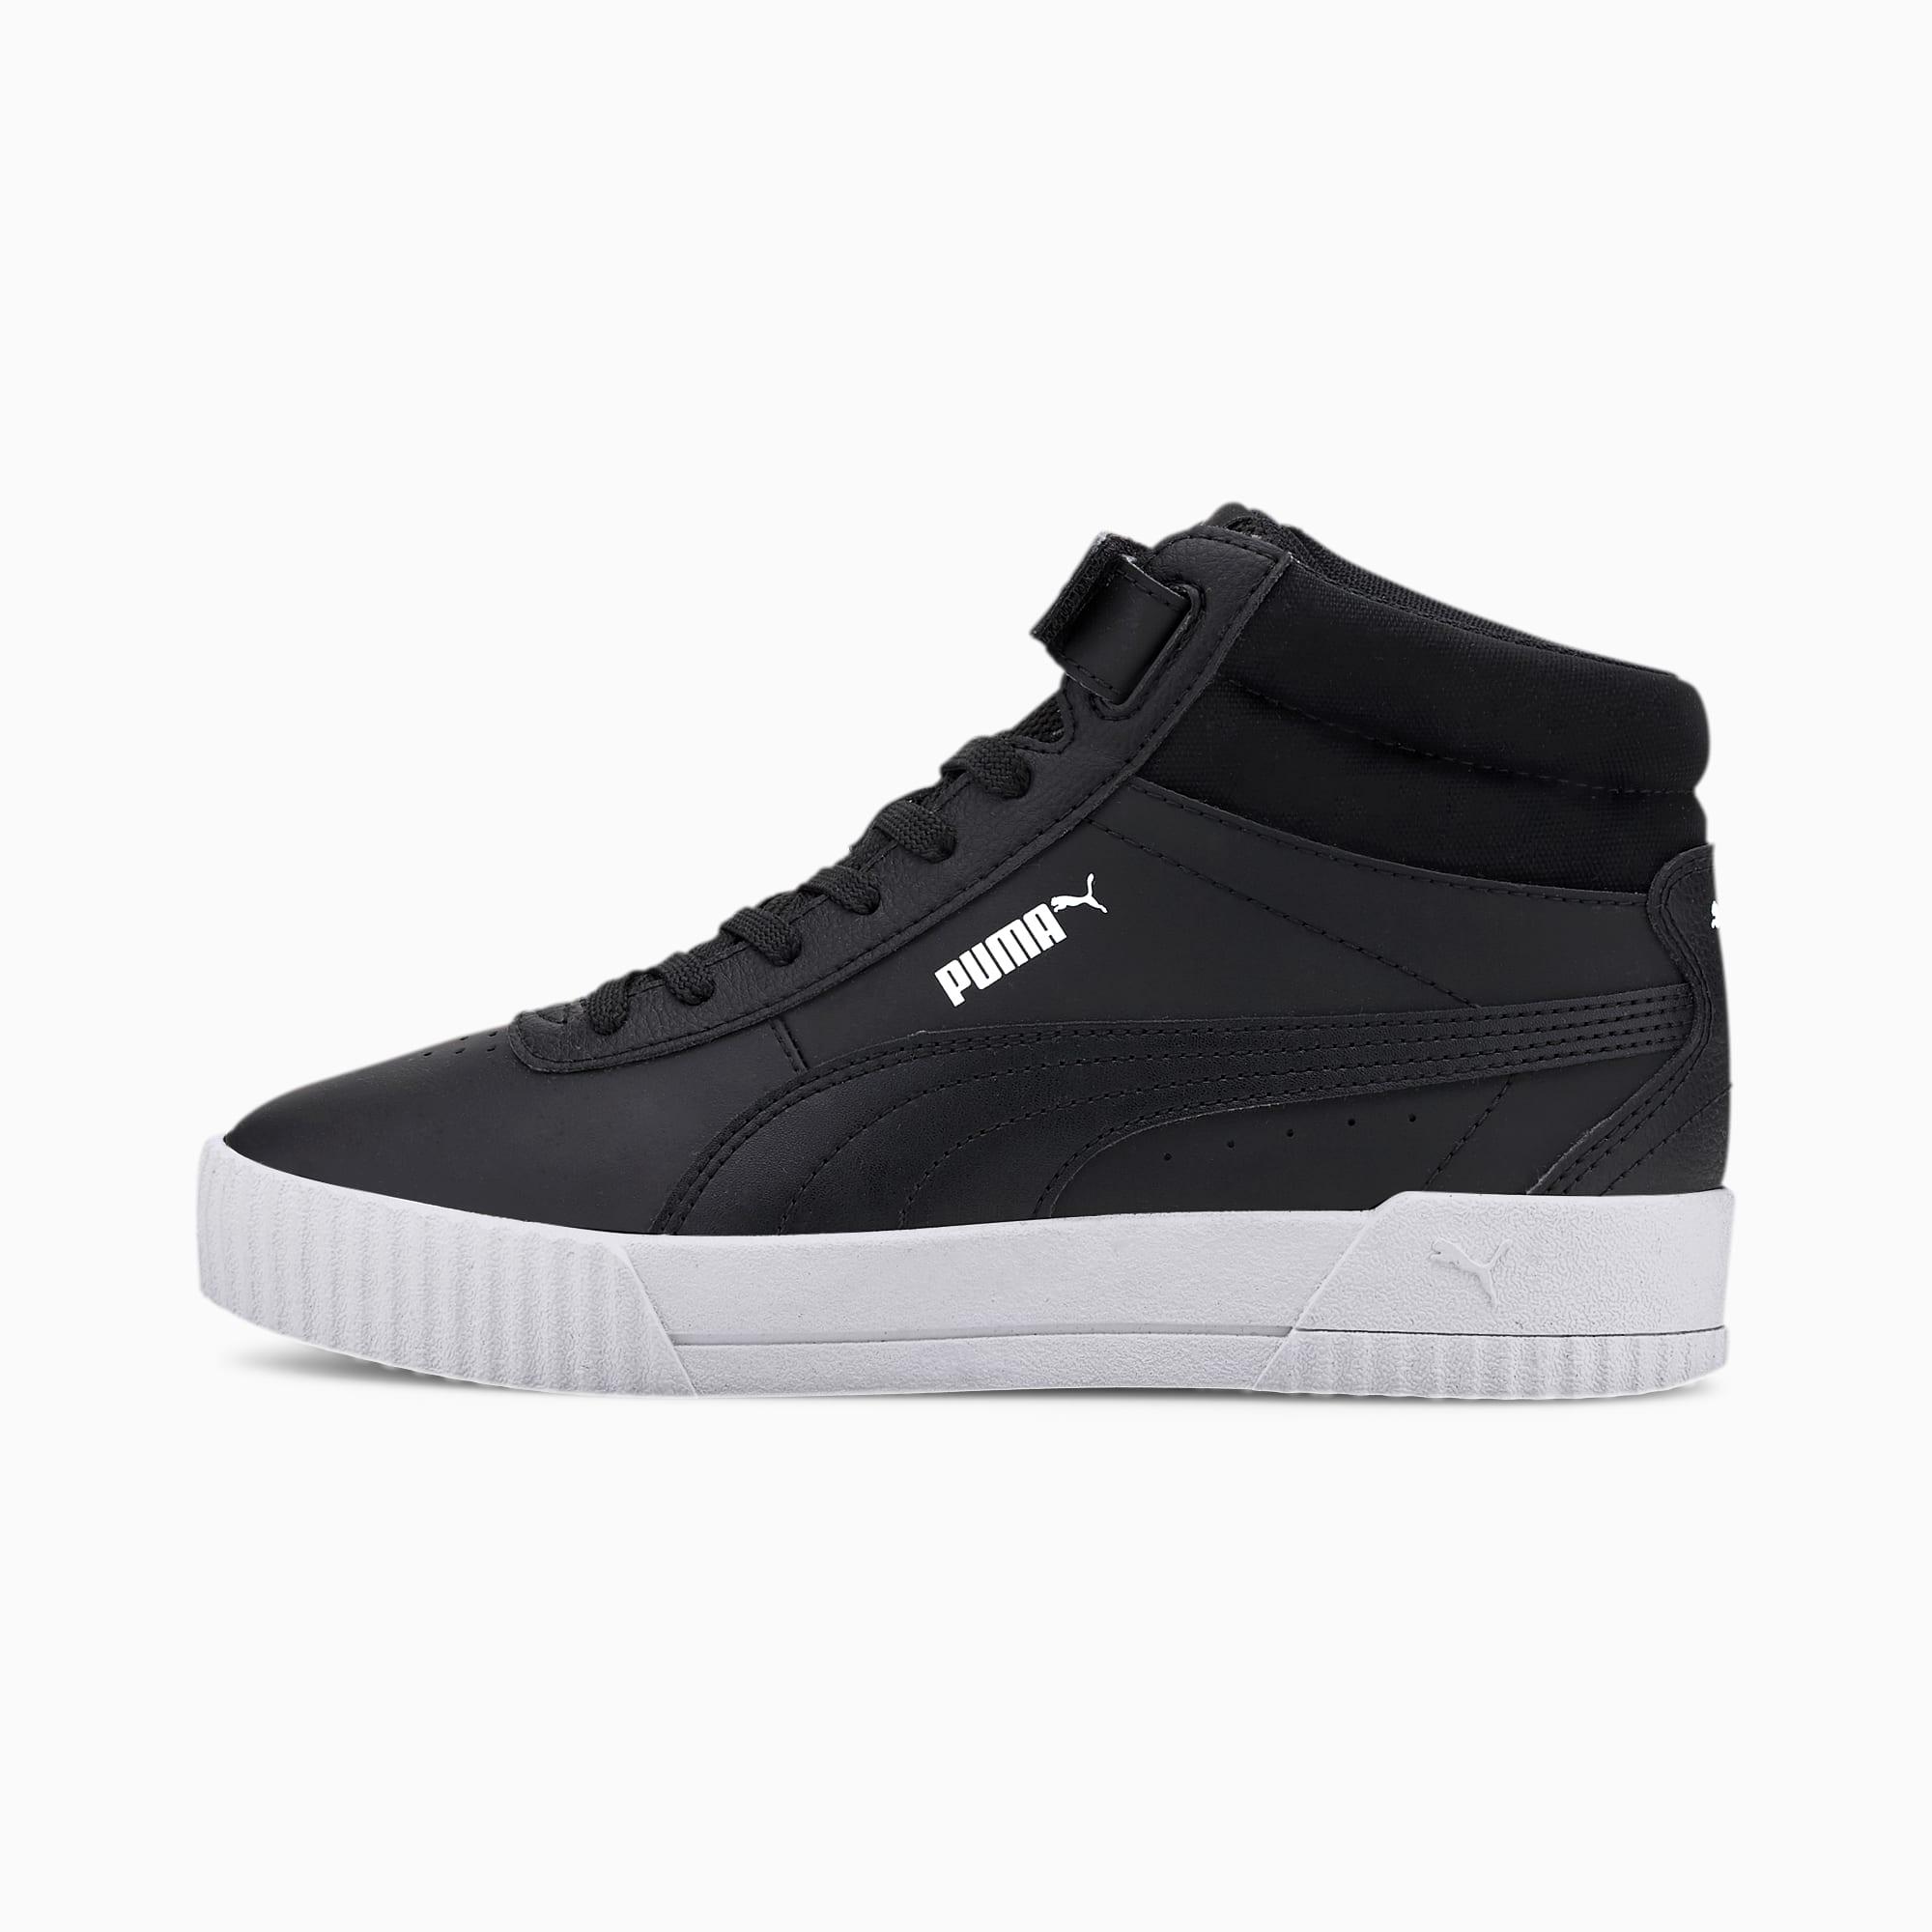 PUMA Chaussure Basket montante Carina femme, Noir, Taille 37.5, Chaussures